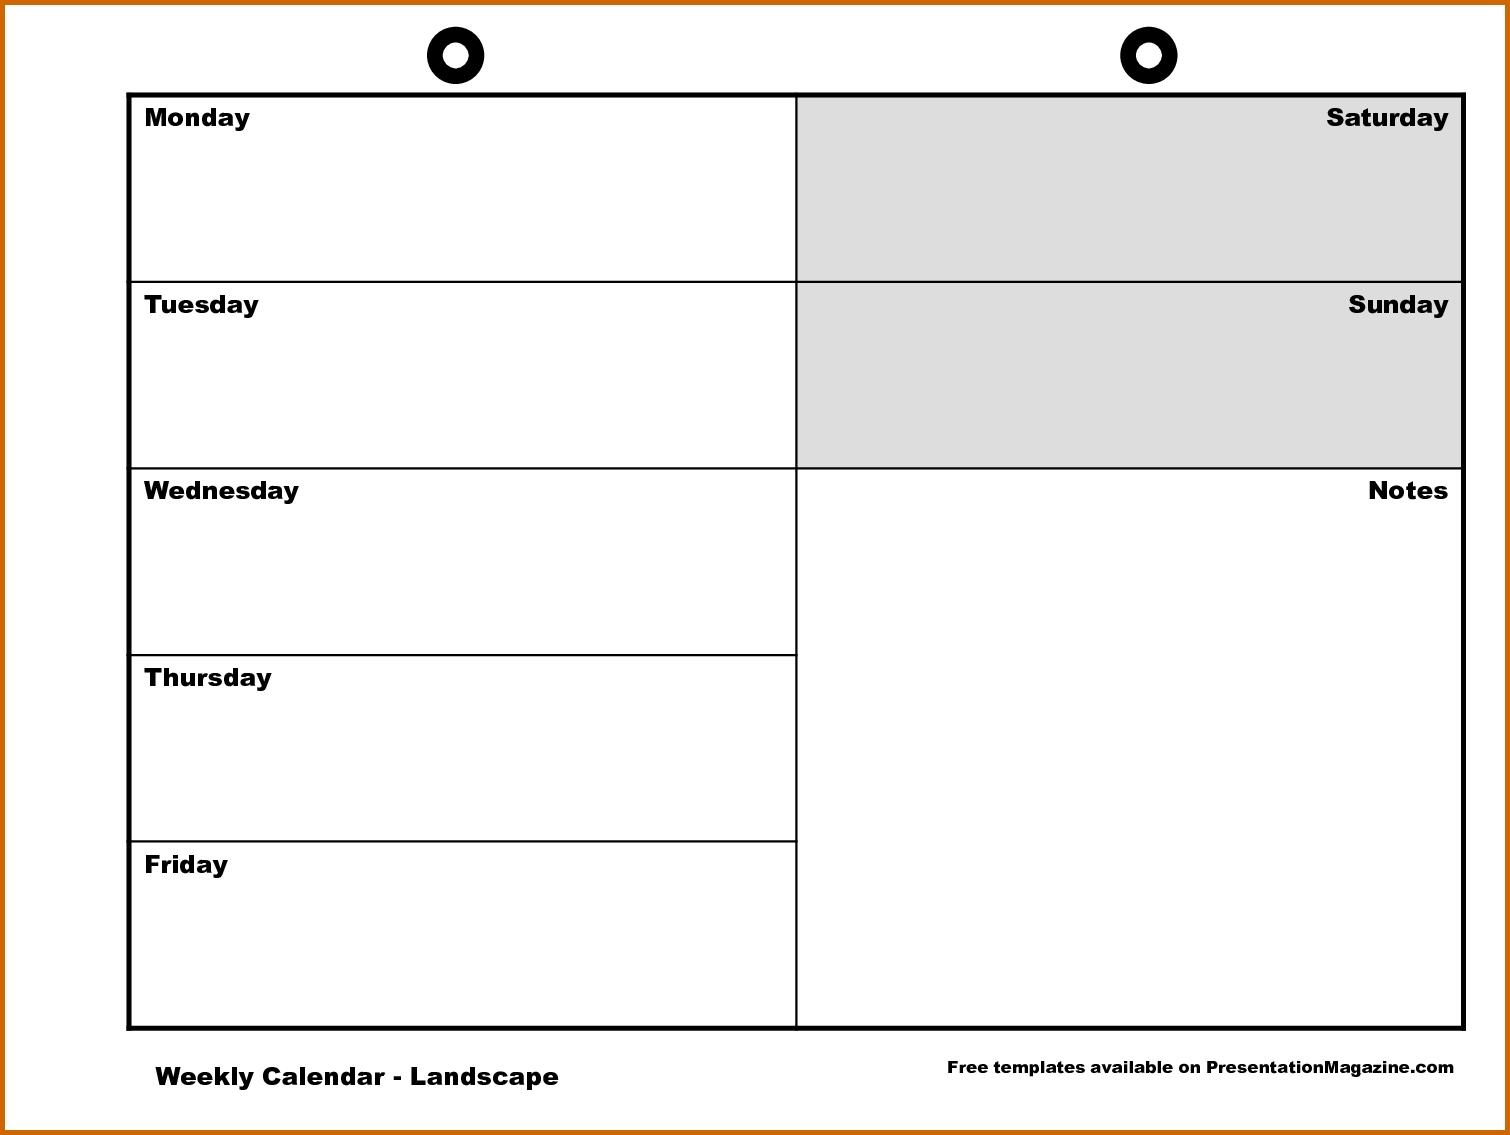 11 Monday Through Friday Printable Calendar Lease Template3abry